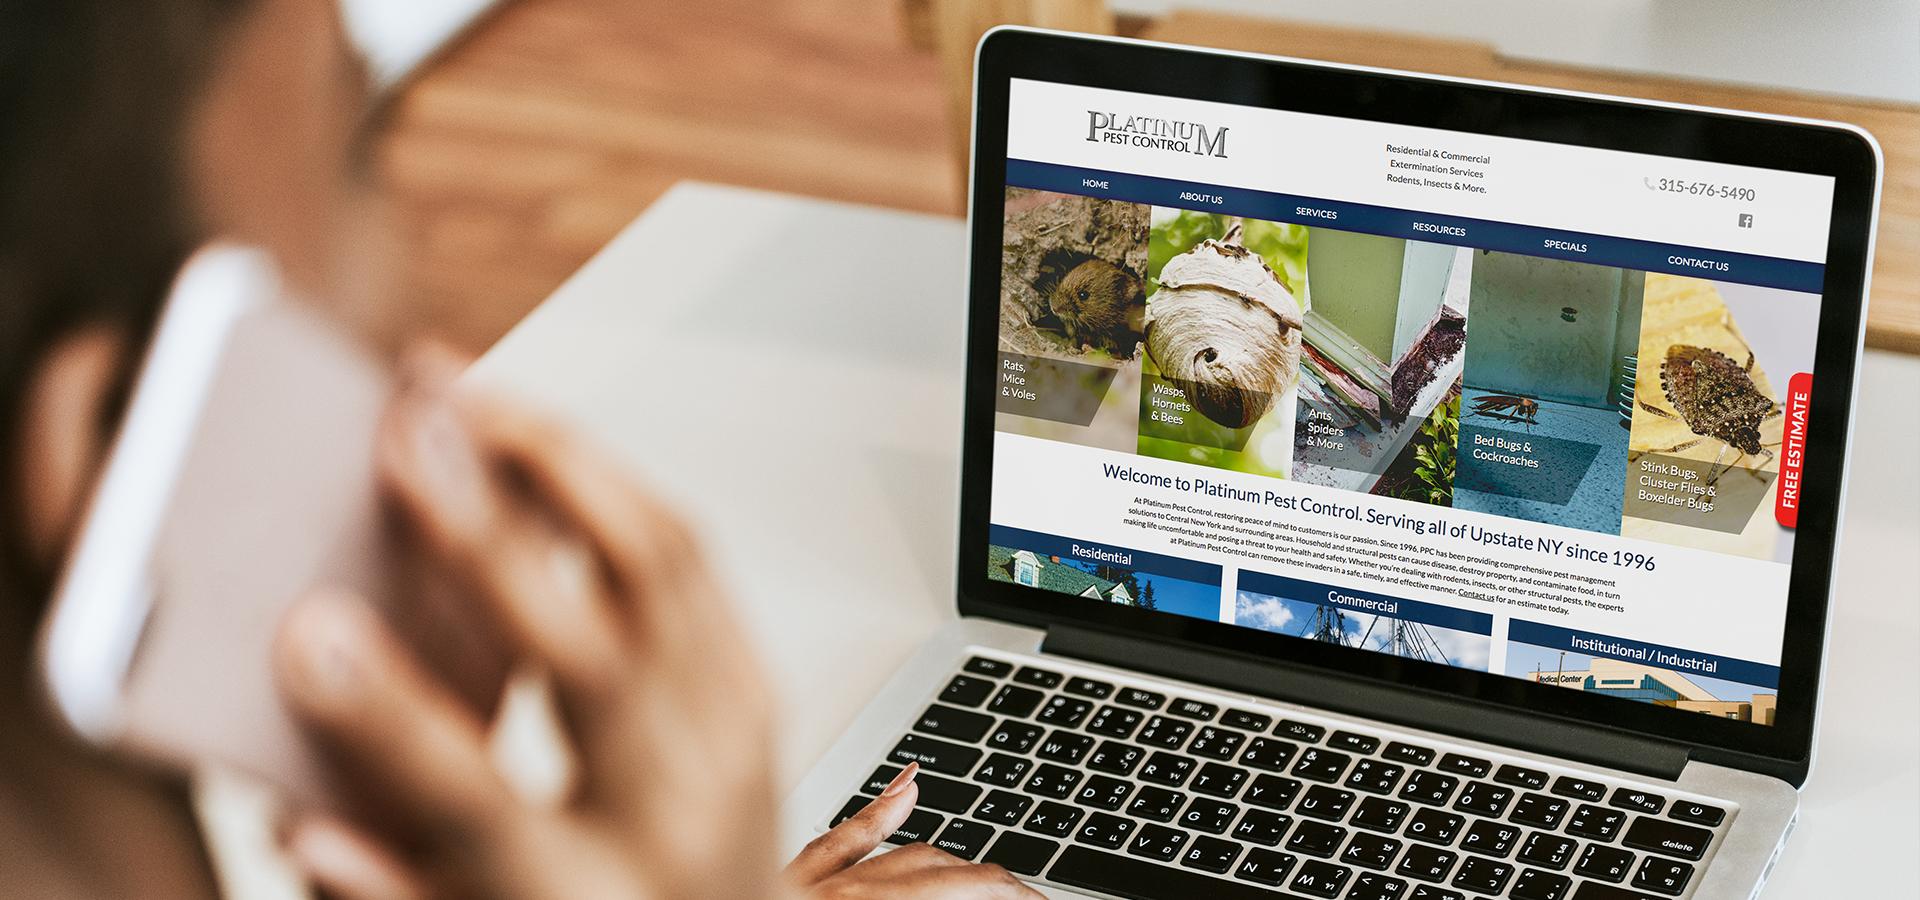 Platinum Pest Control website on laptop